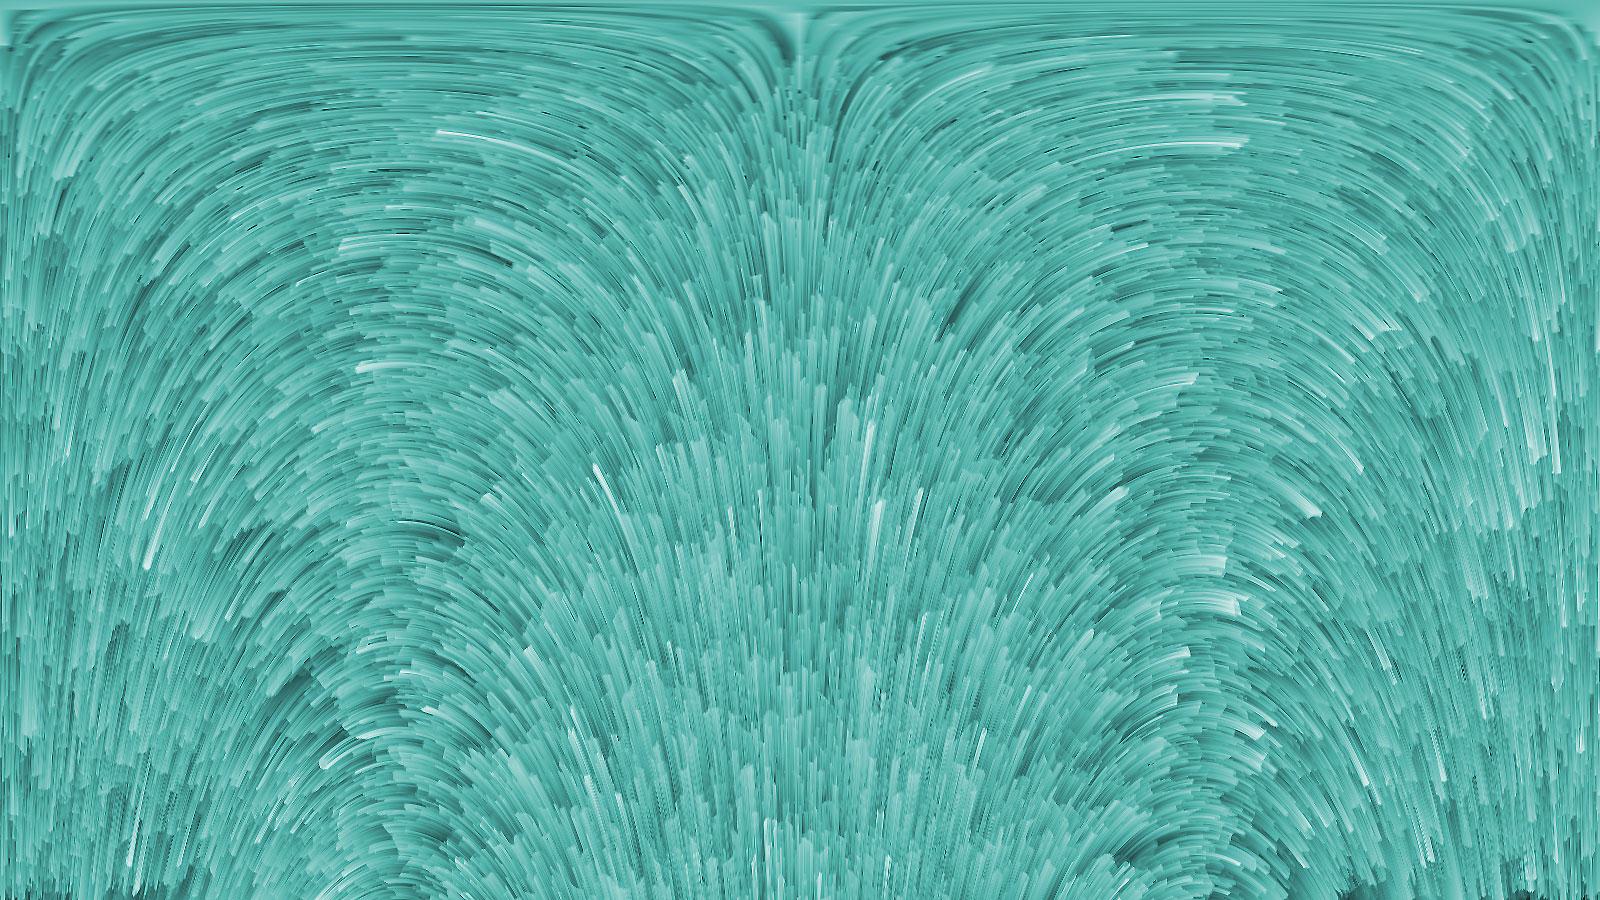 Solid Blue Backgrounds Wallpaper Hd Background Desktop 1600x900